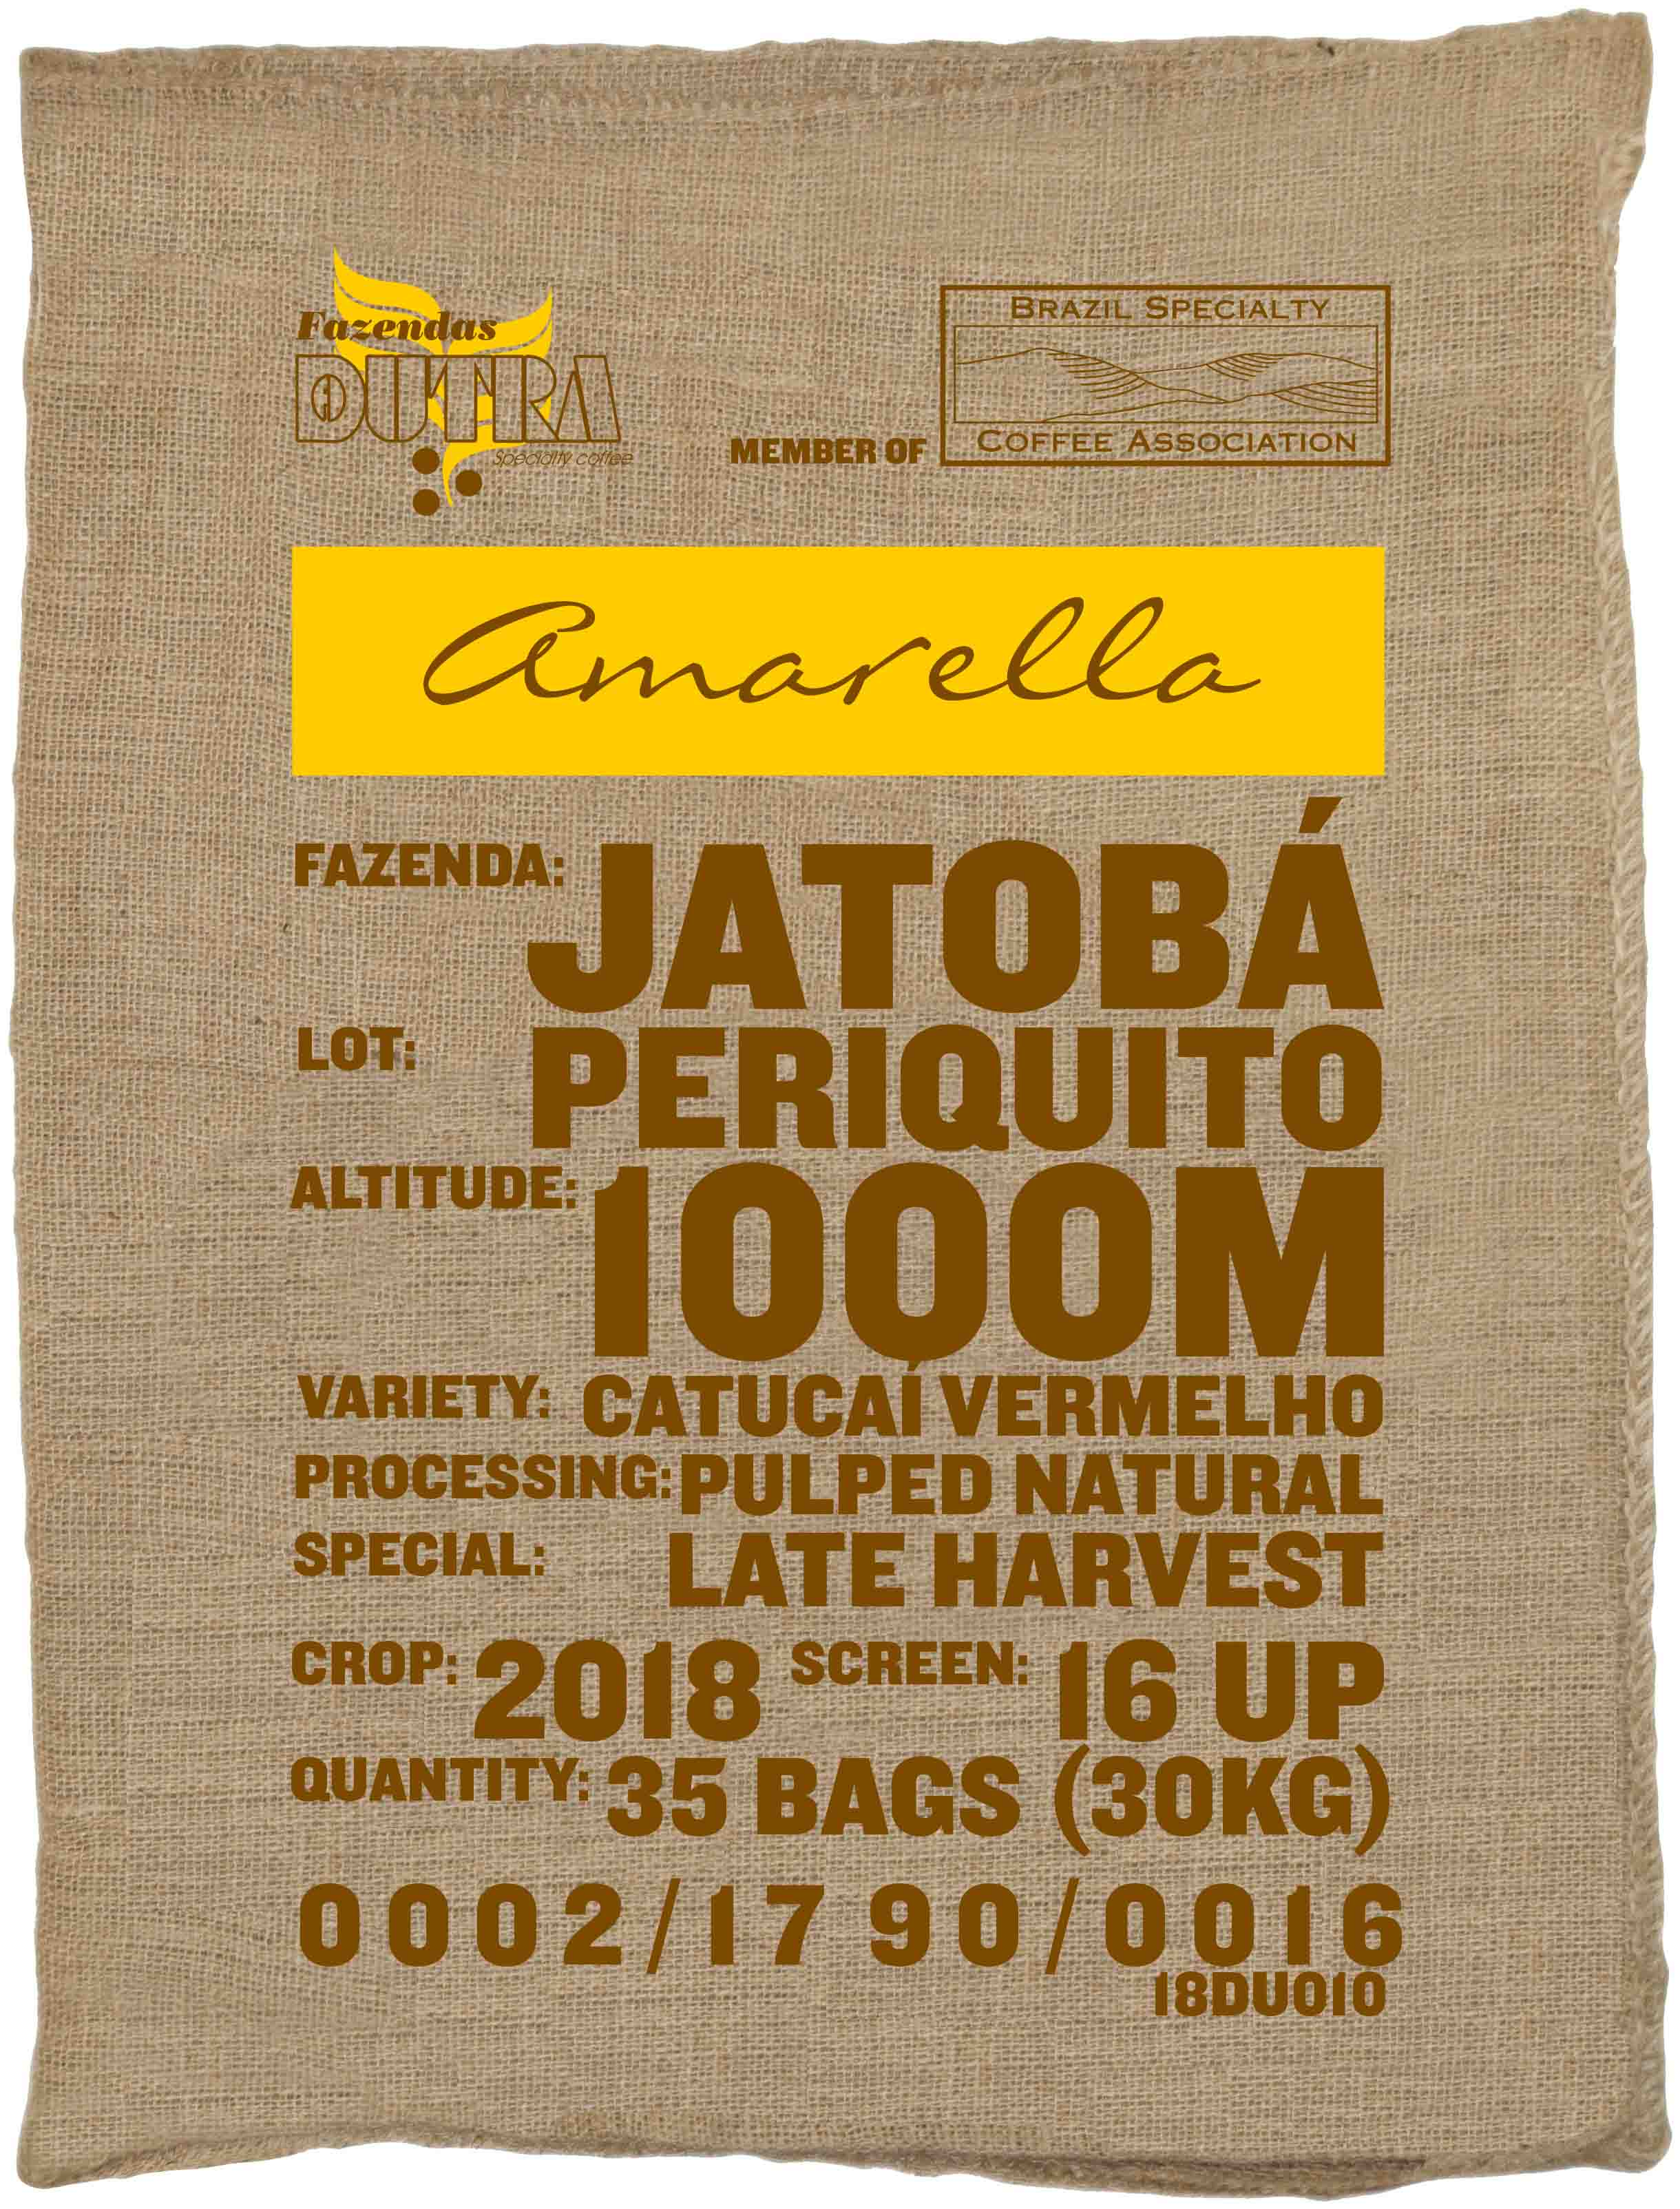 Ein Rohkaffeesack amarella Parzellenkaffee Varietät Catucai vermelho. Fazendas Dutra Lot Periquito.